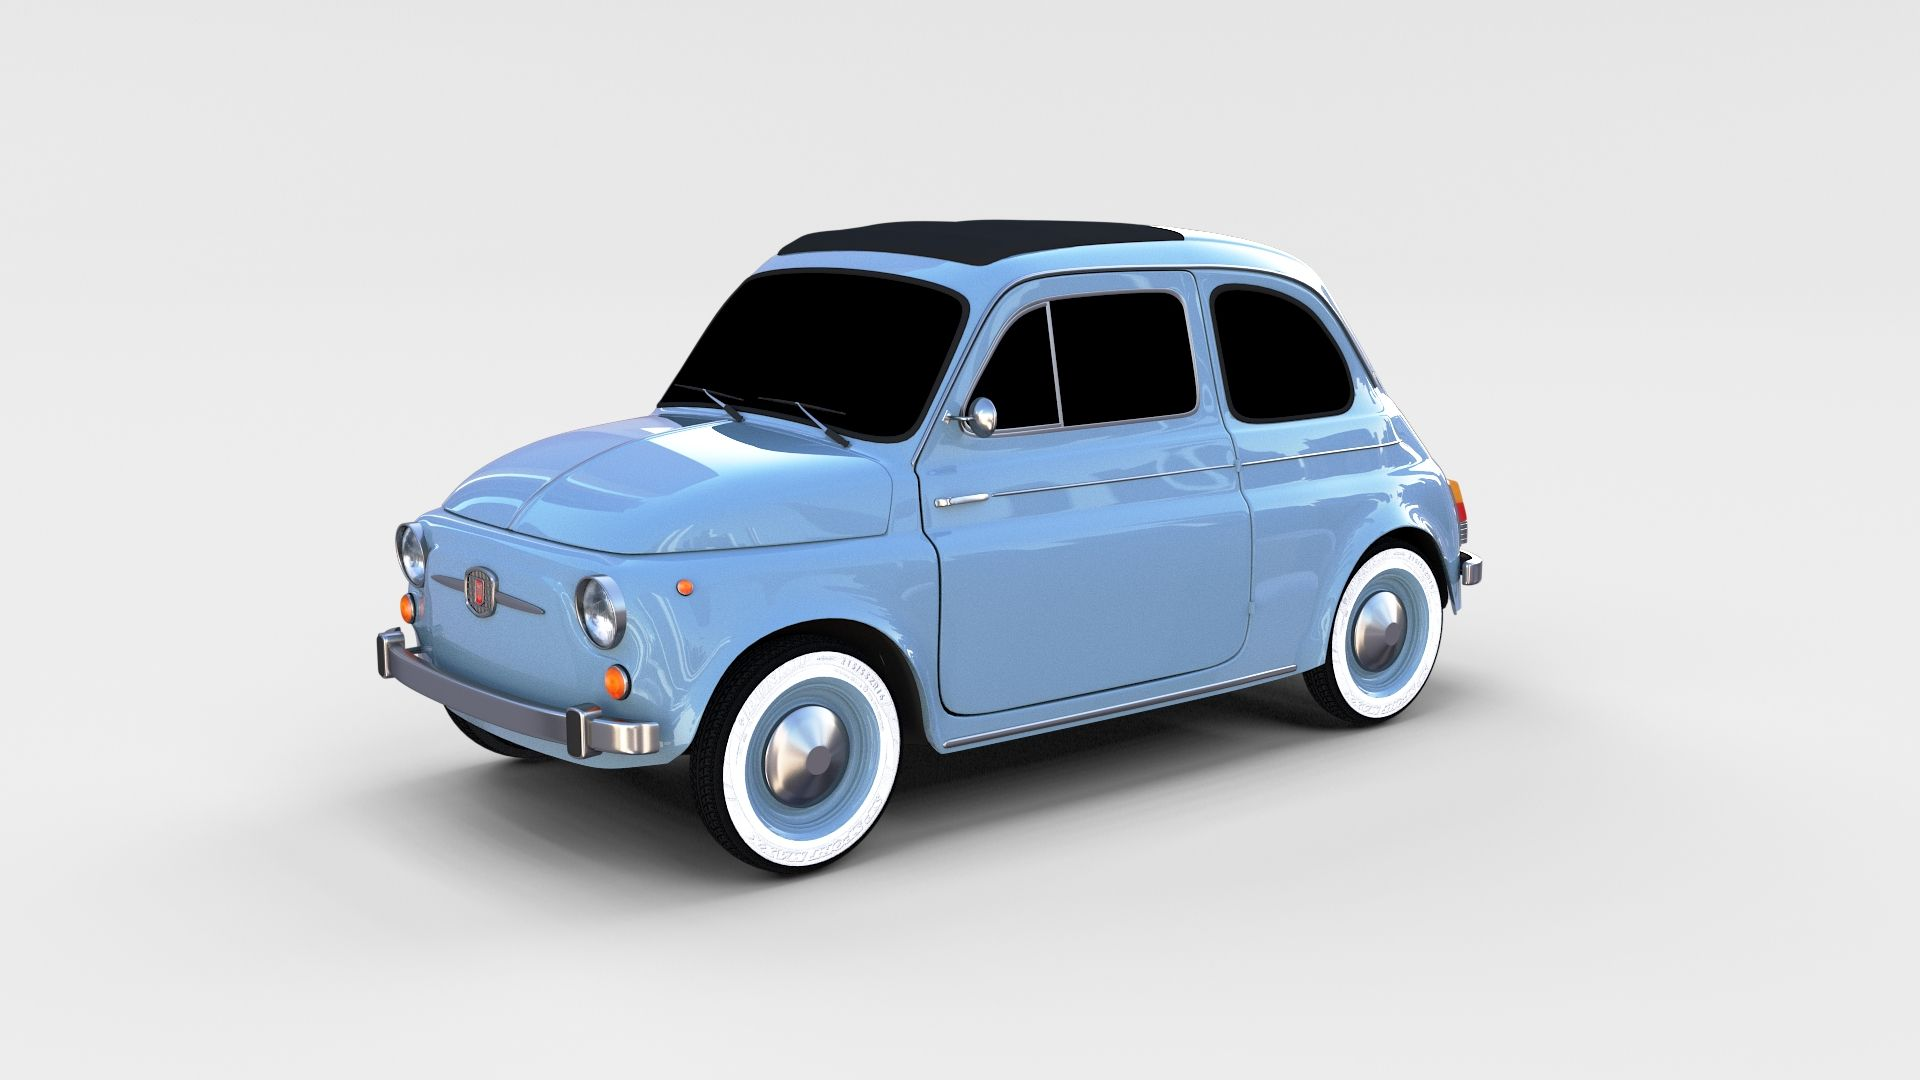 Fiat 500 Pack Fiat 500 Fiat Fiat 500 Models